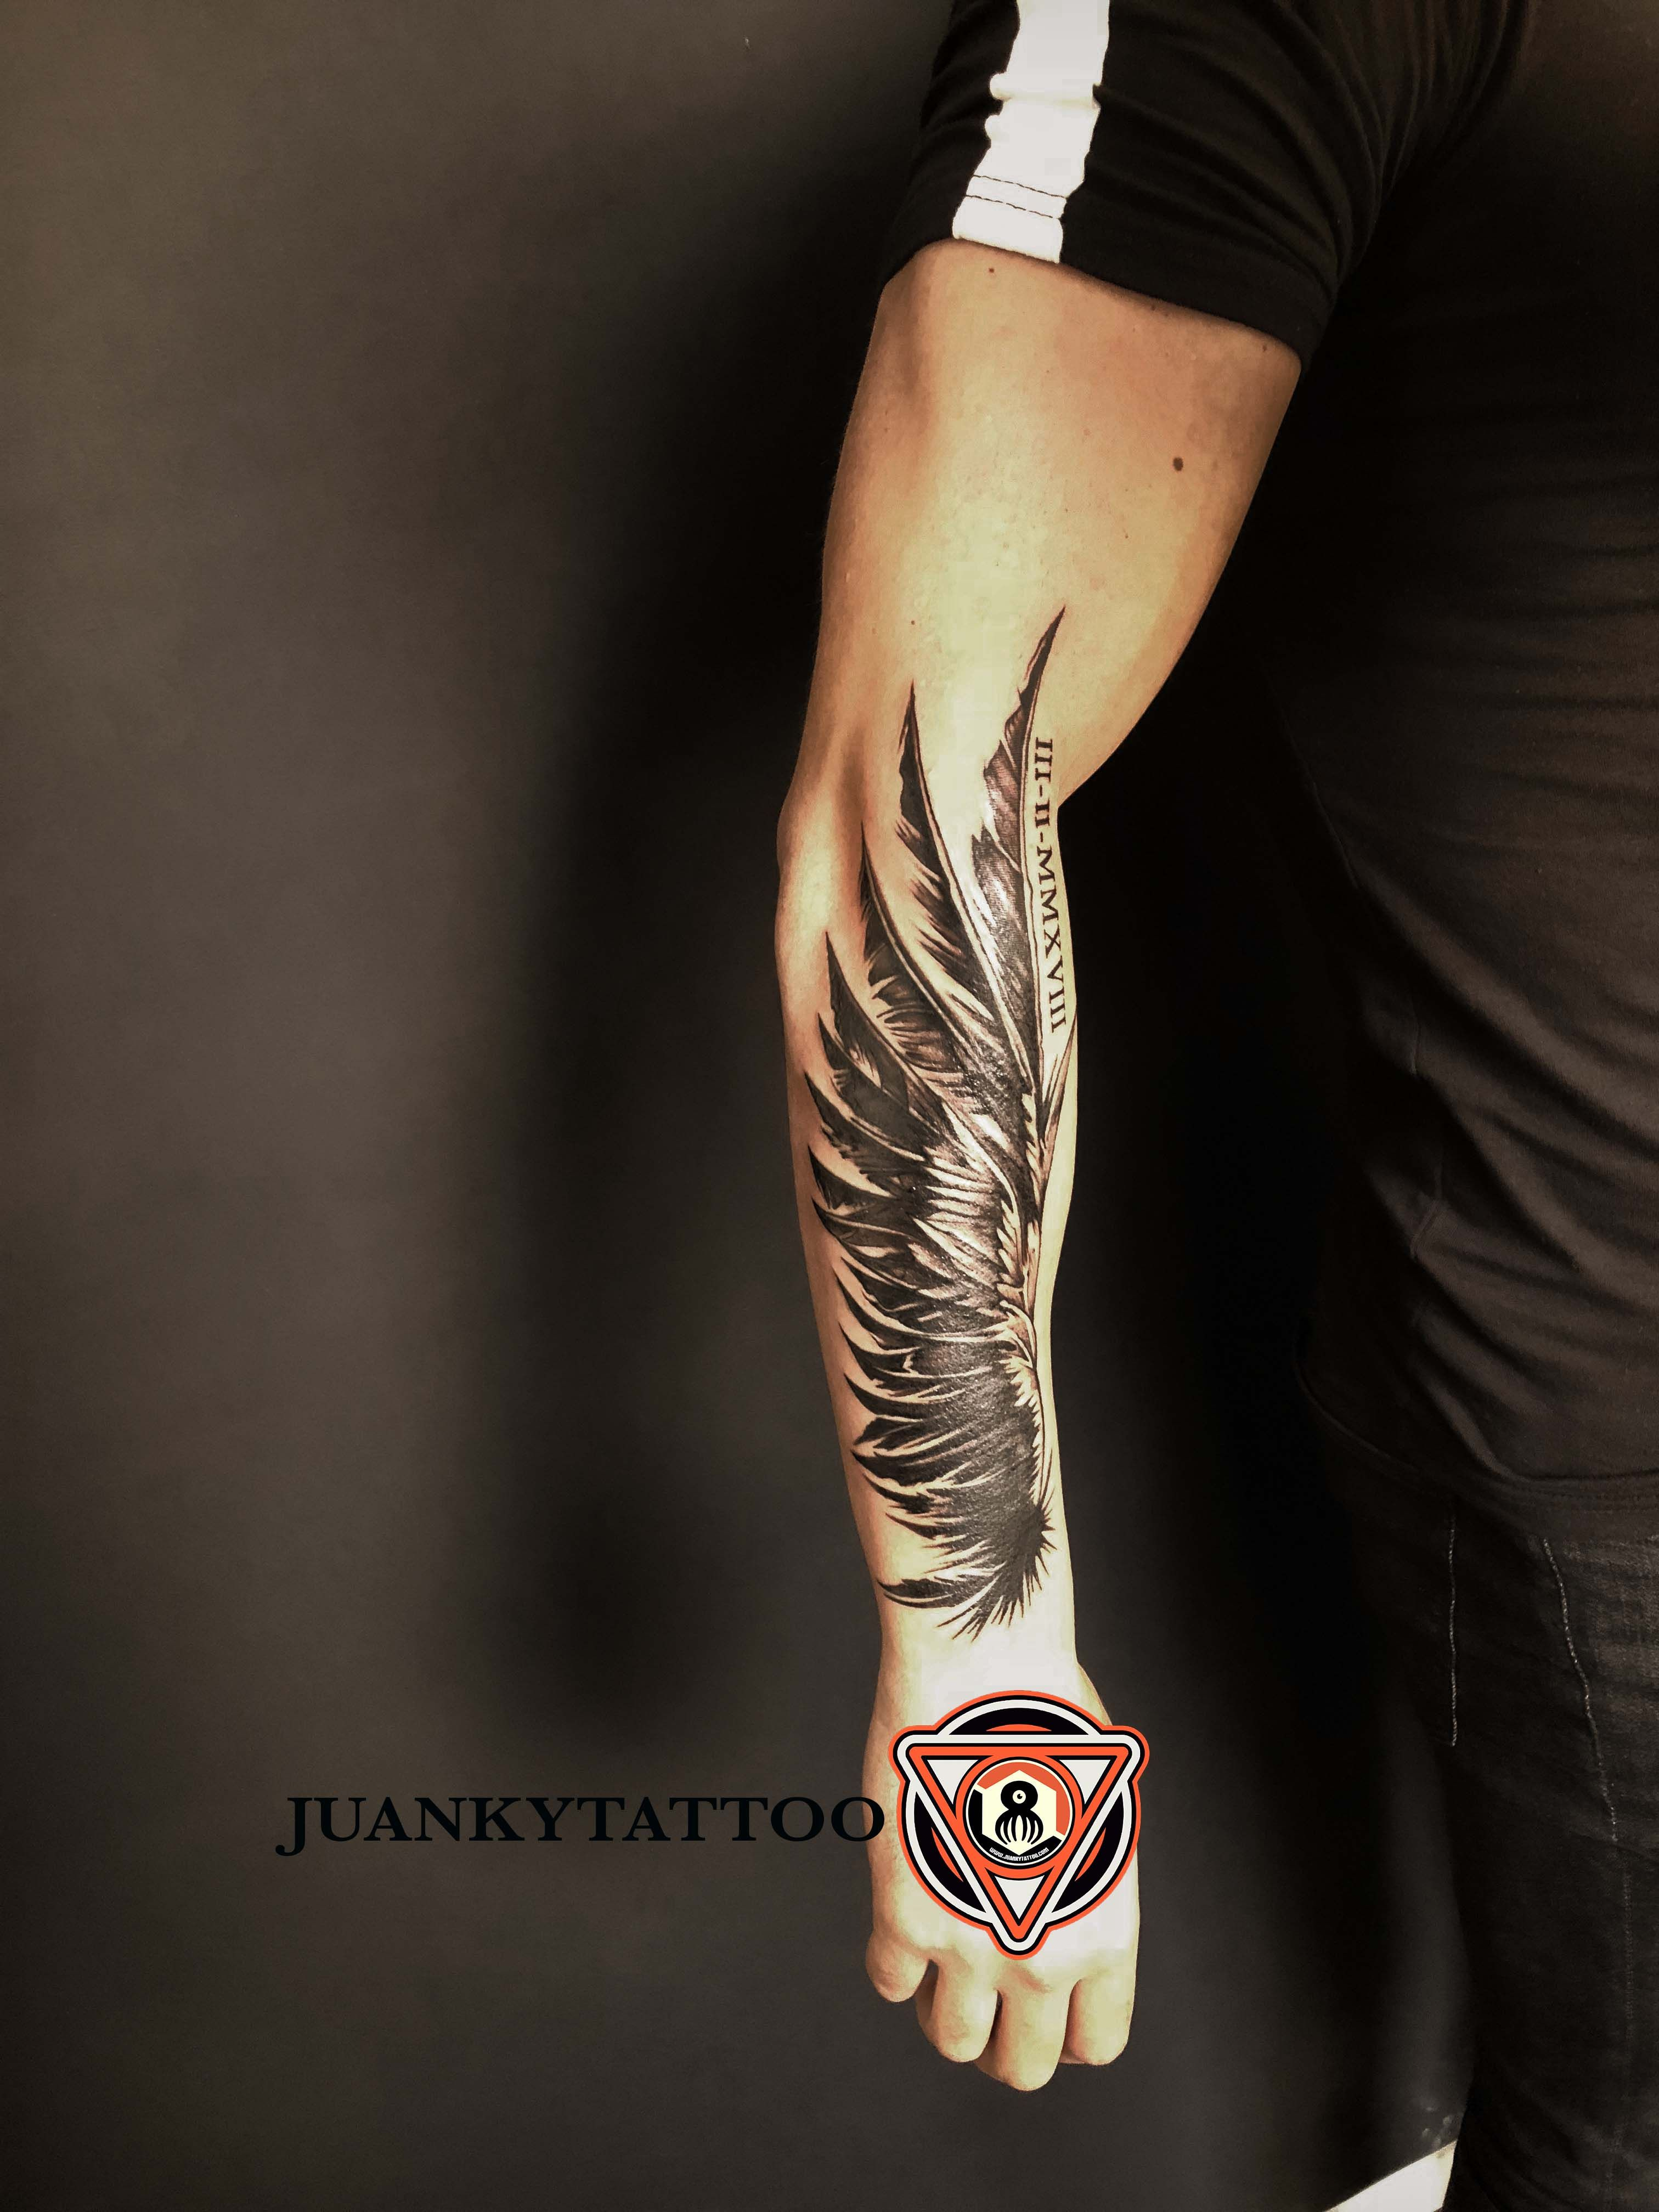 Disposición de  ala en antebrazo,sesión de 3 horas  is part of Tattoos -